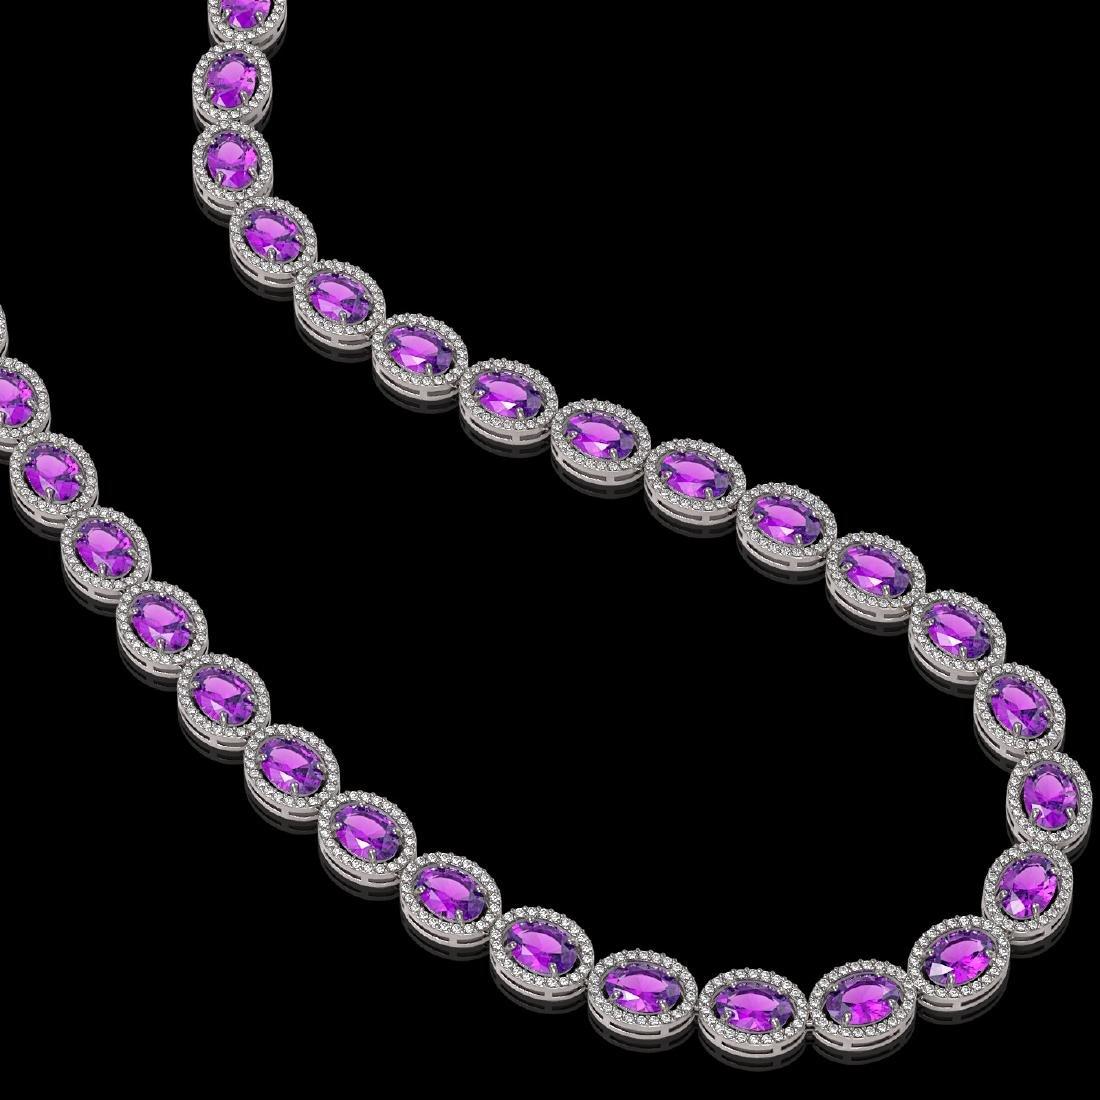 45.16 CTW Amethyst & Diamond Halo Necklace 10K White - 2